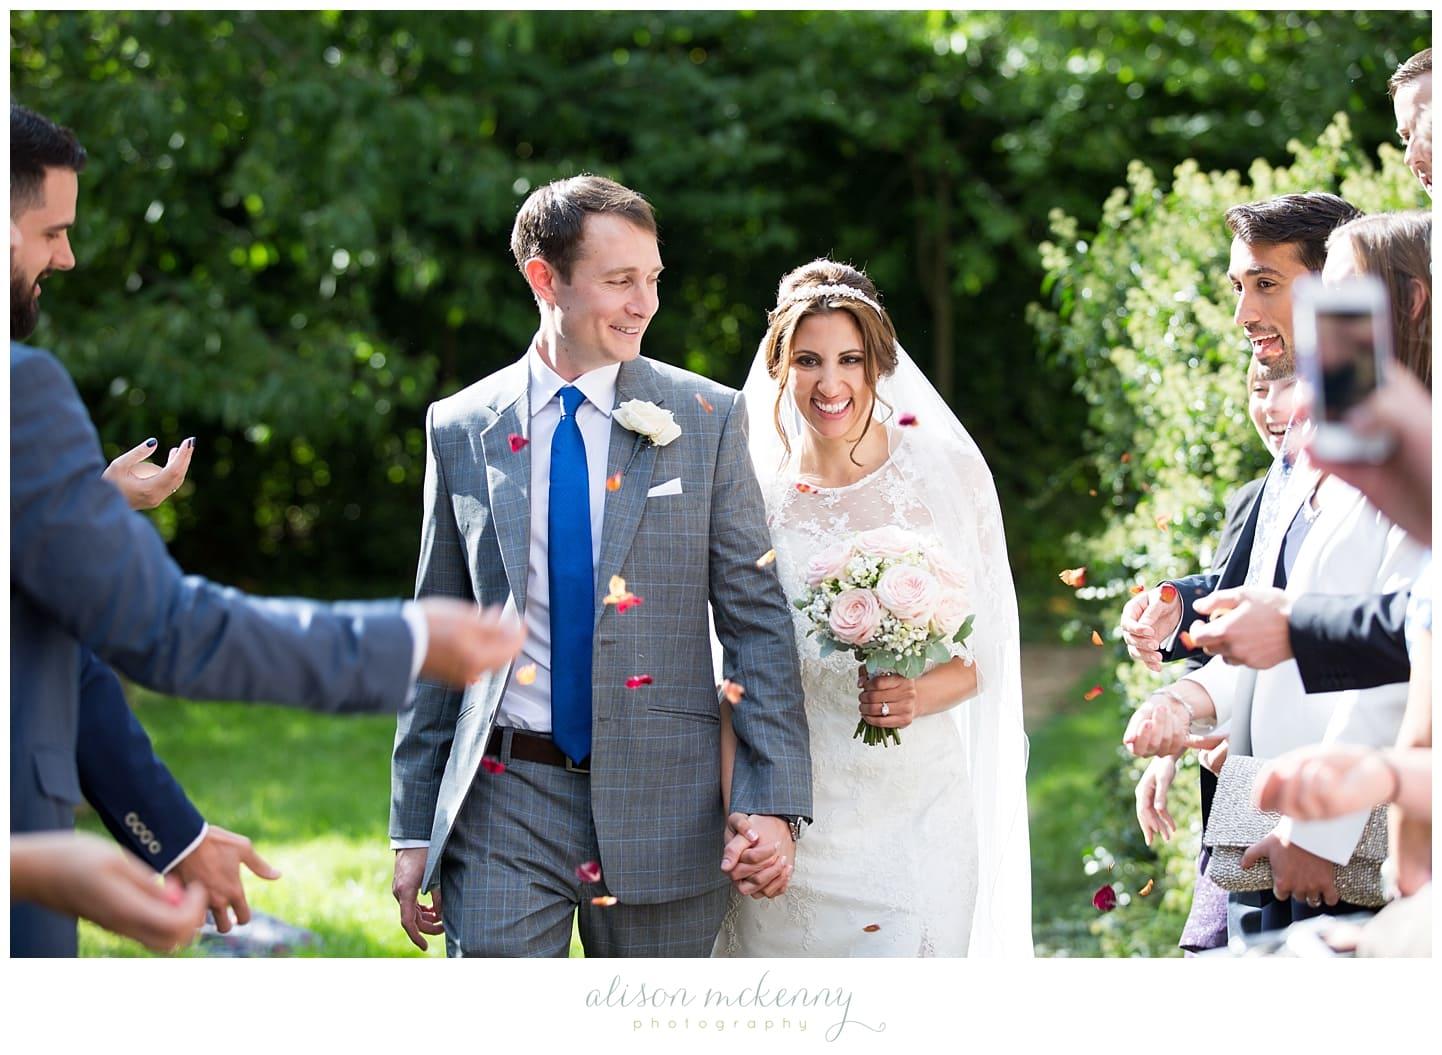 Boxted Hall Wedding Photographer Suffolk_0019